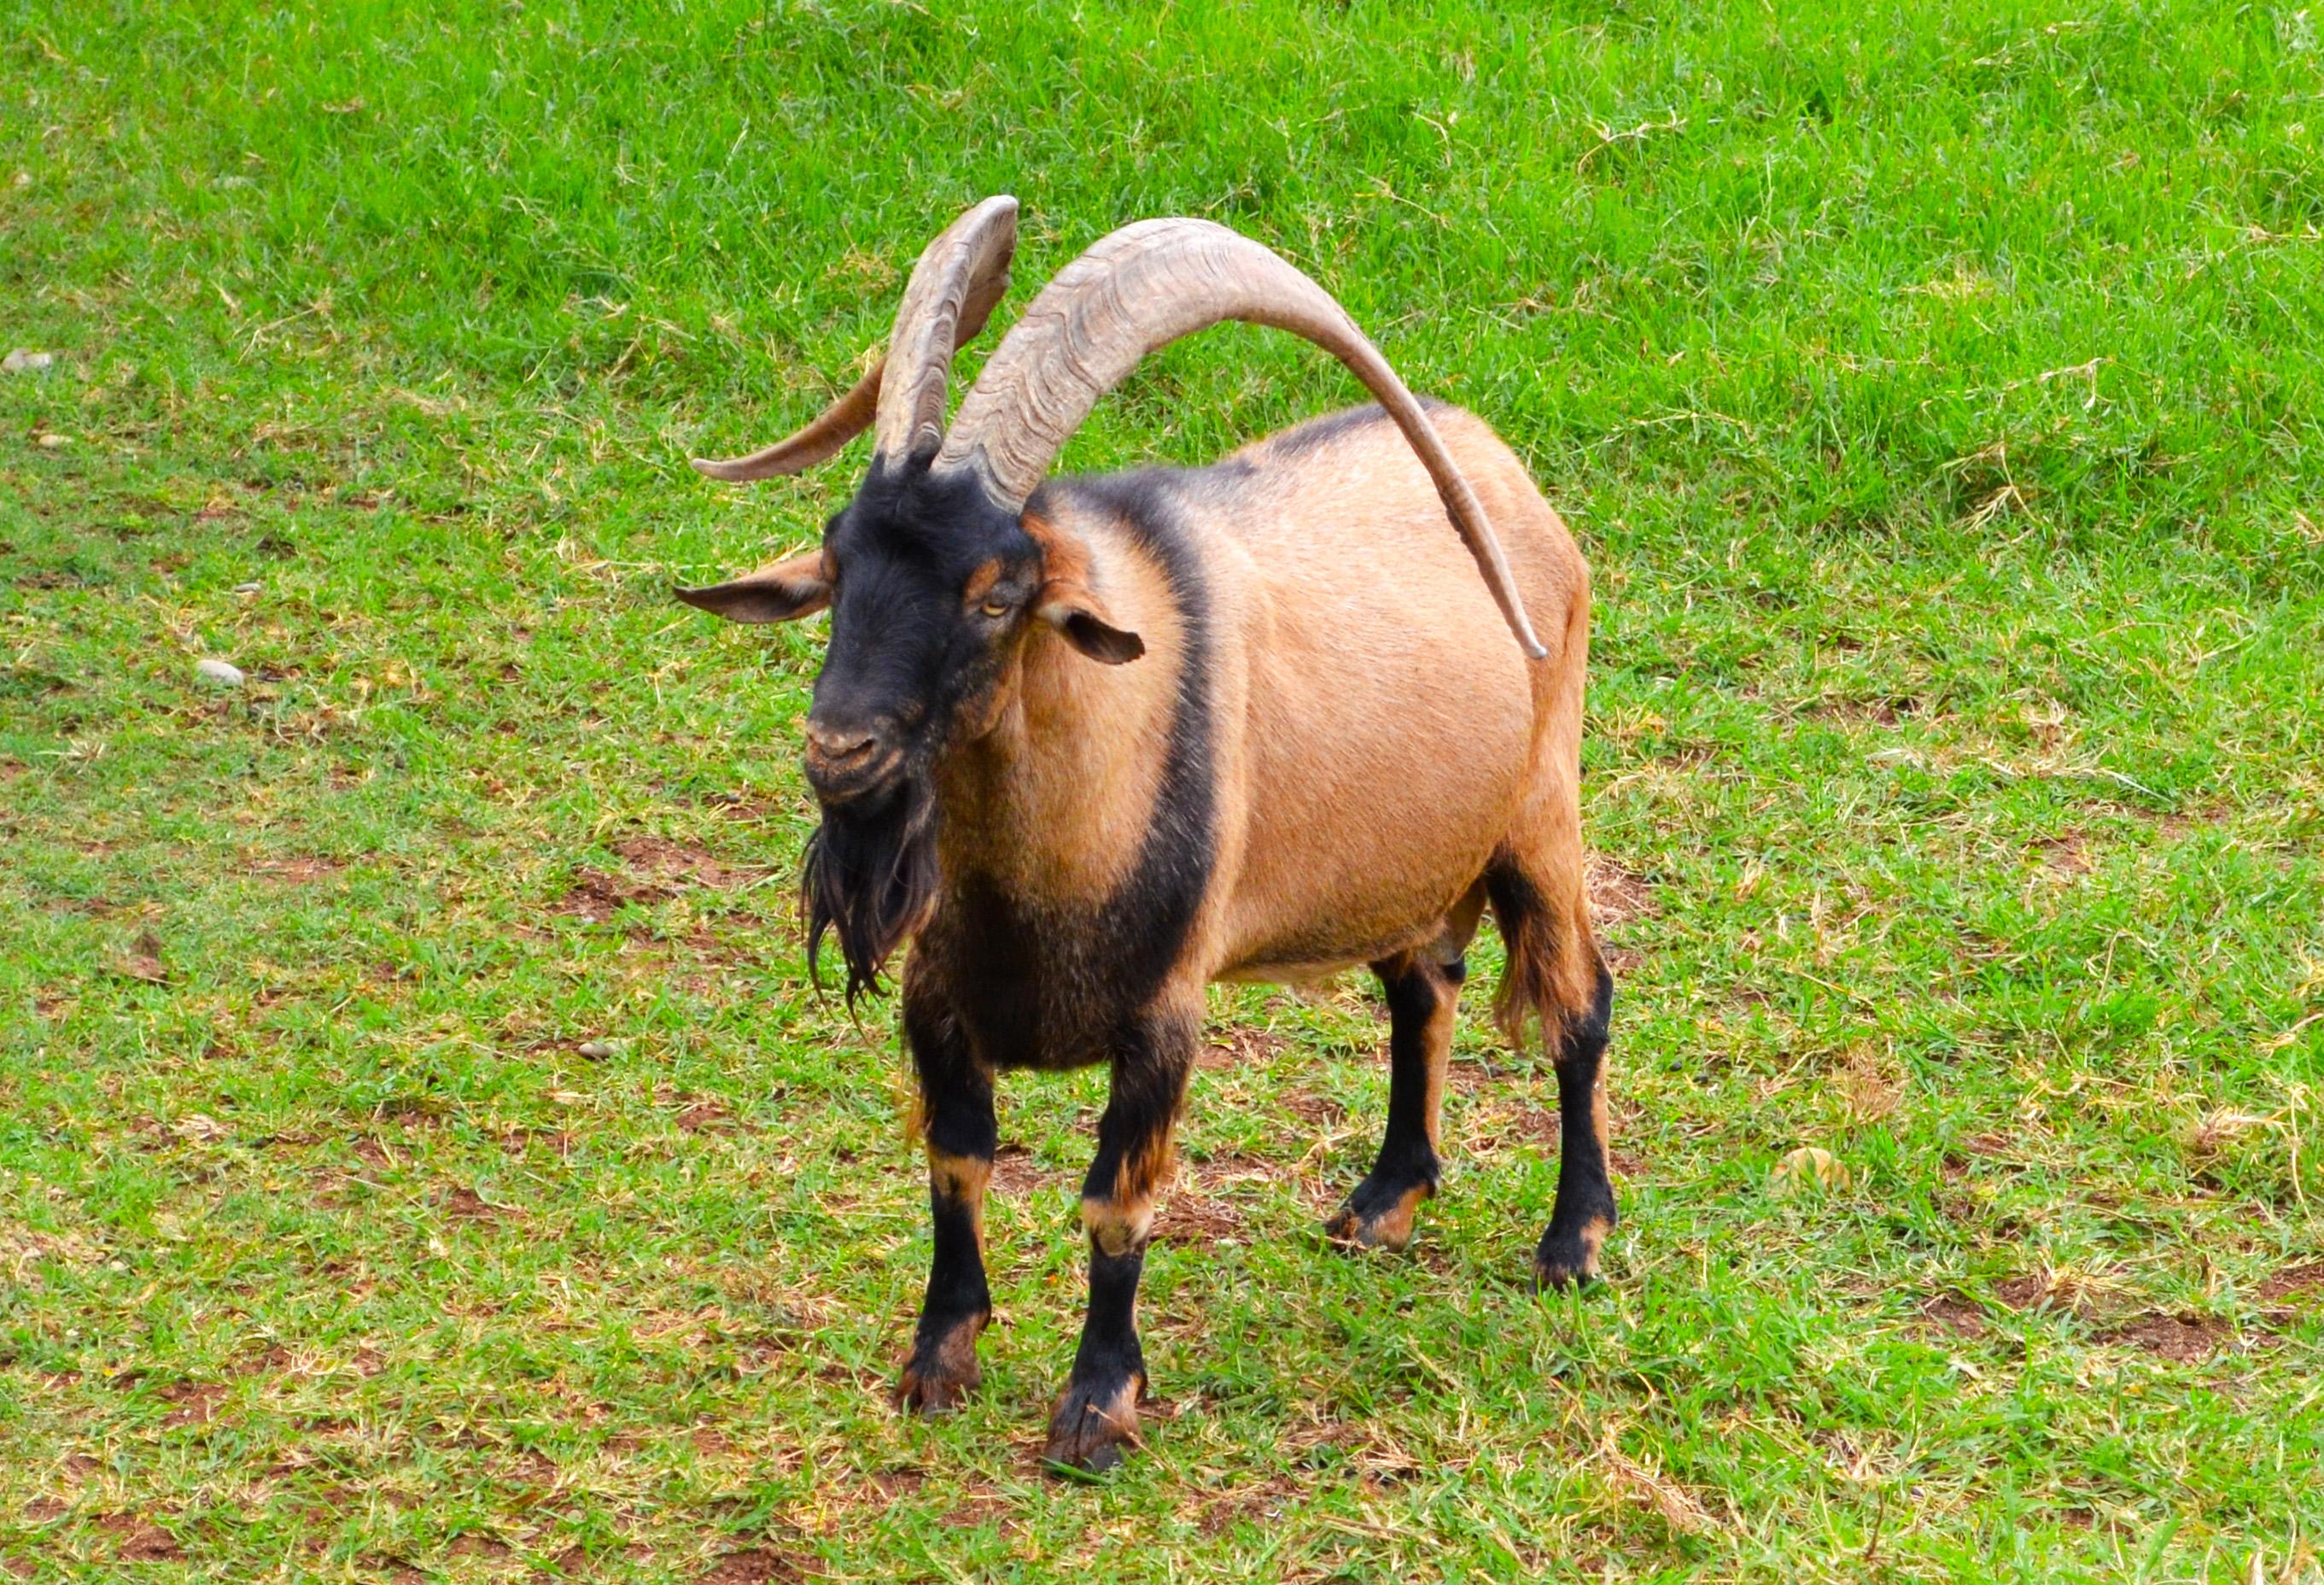 Goat photo